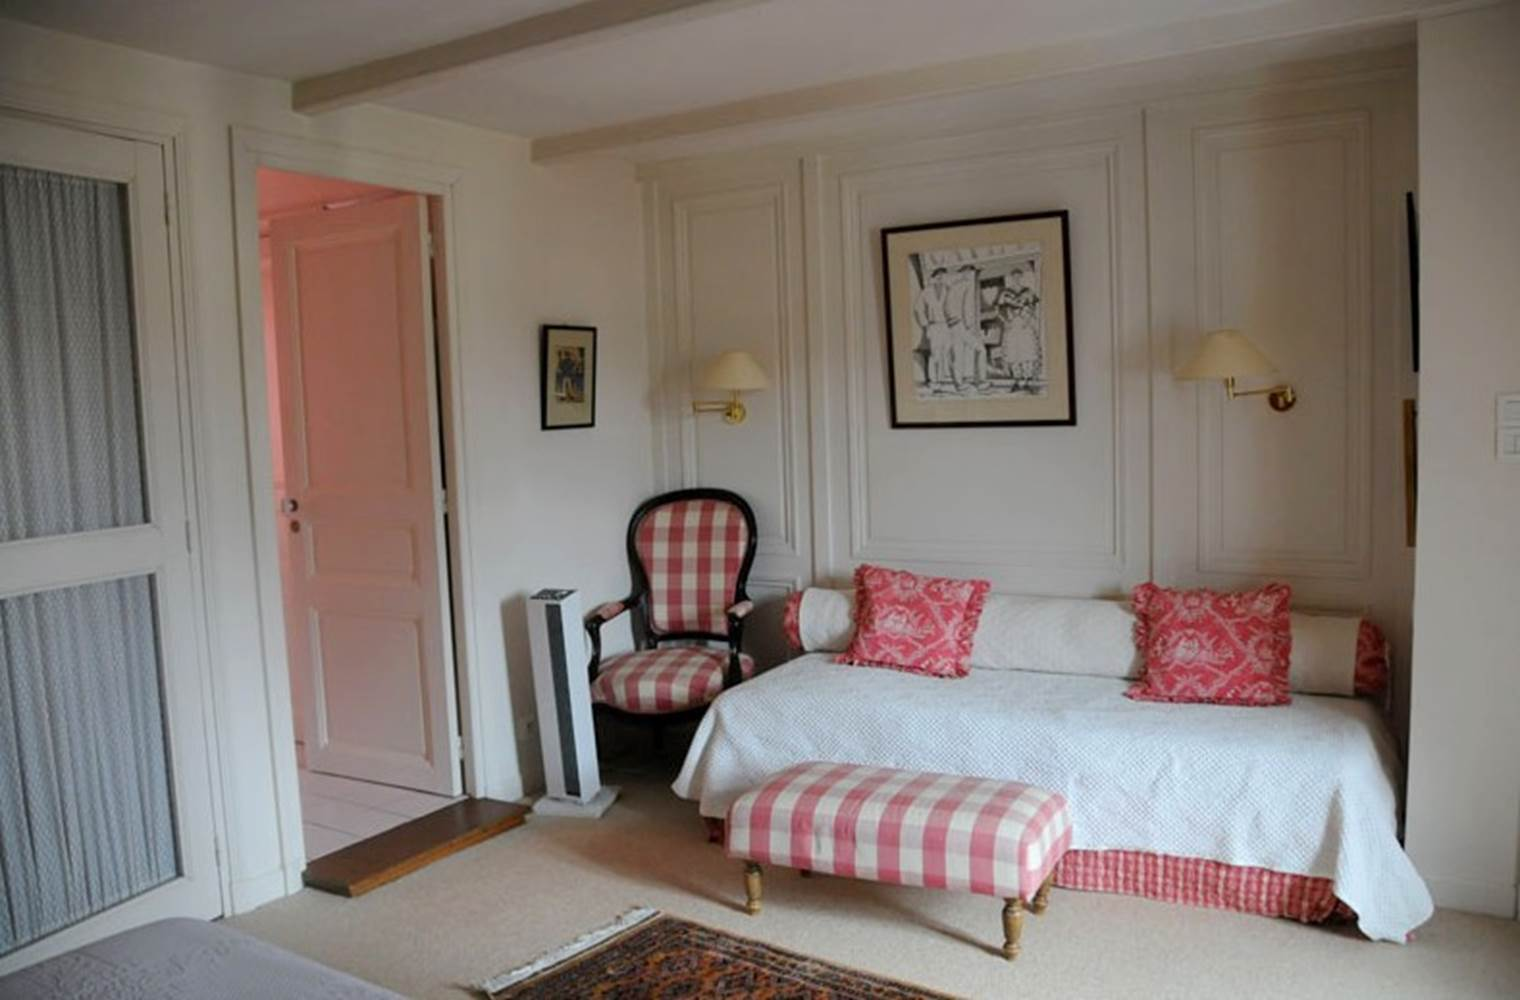 Hotel - Auberge Bretonne - La Roche-Bernard - Tourisme Arc Sud Bretagne ©